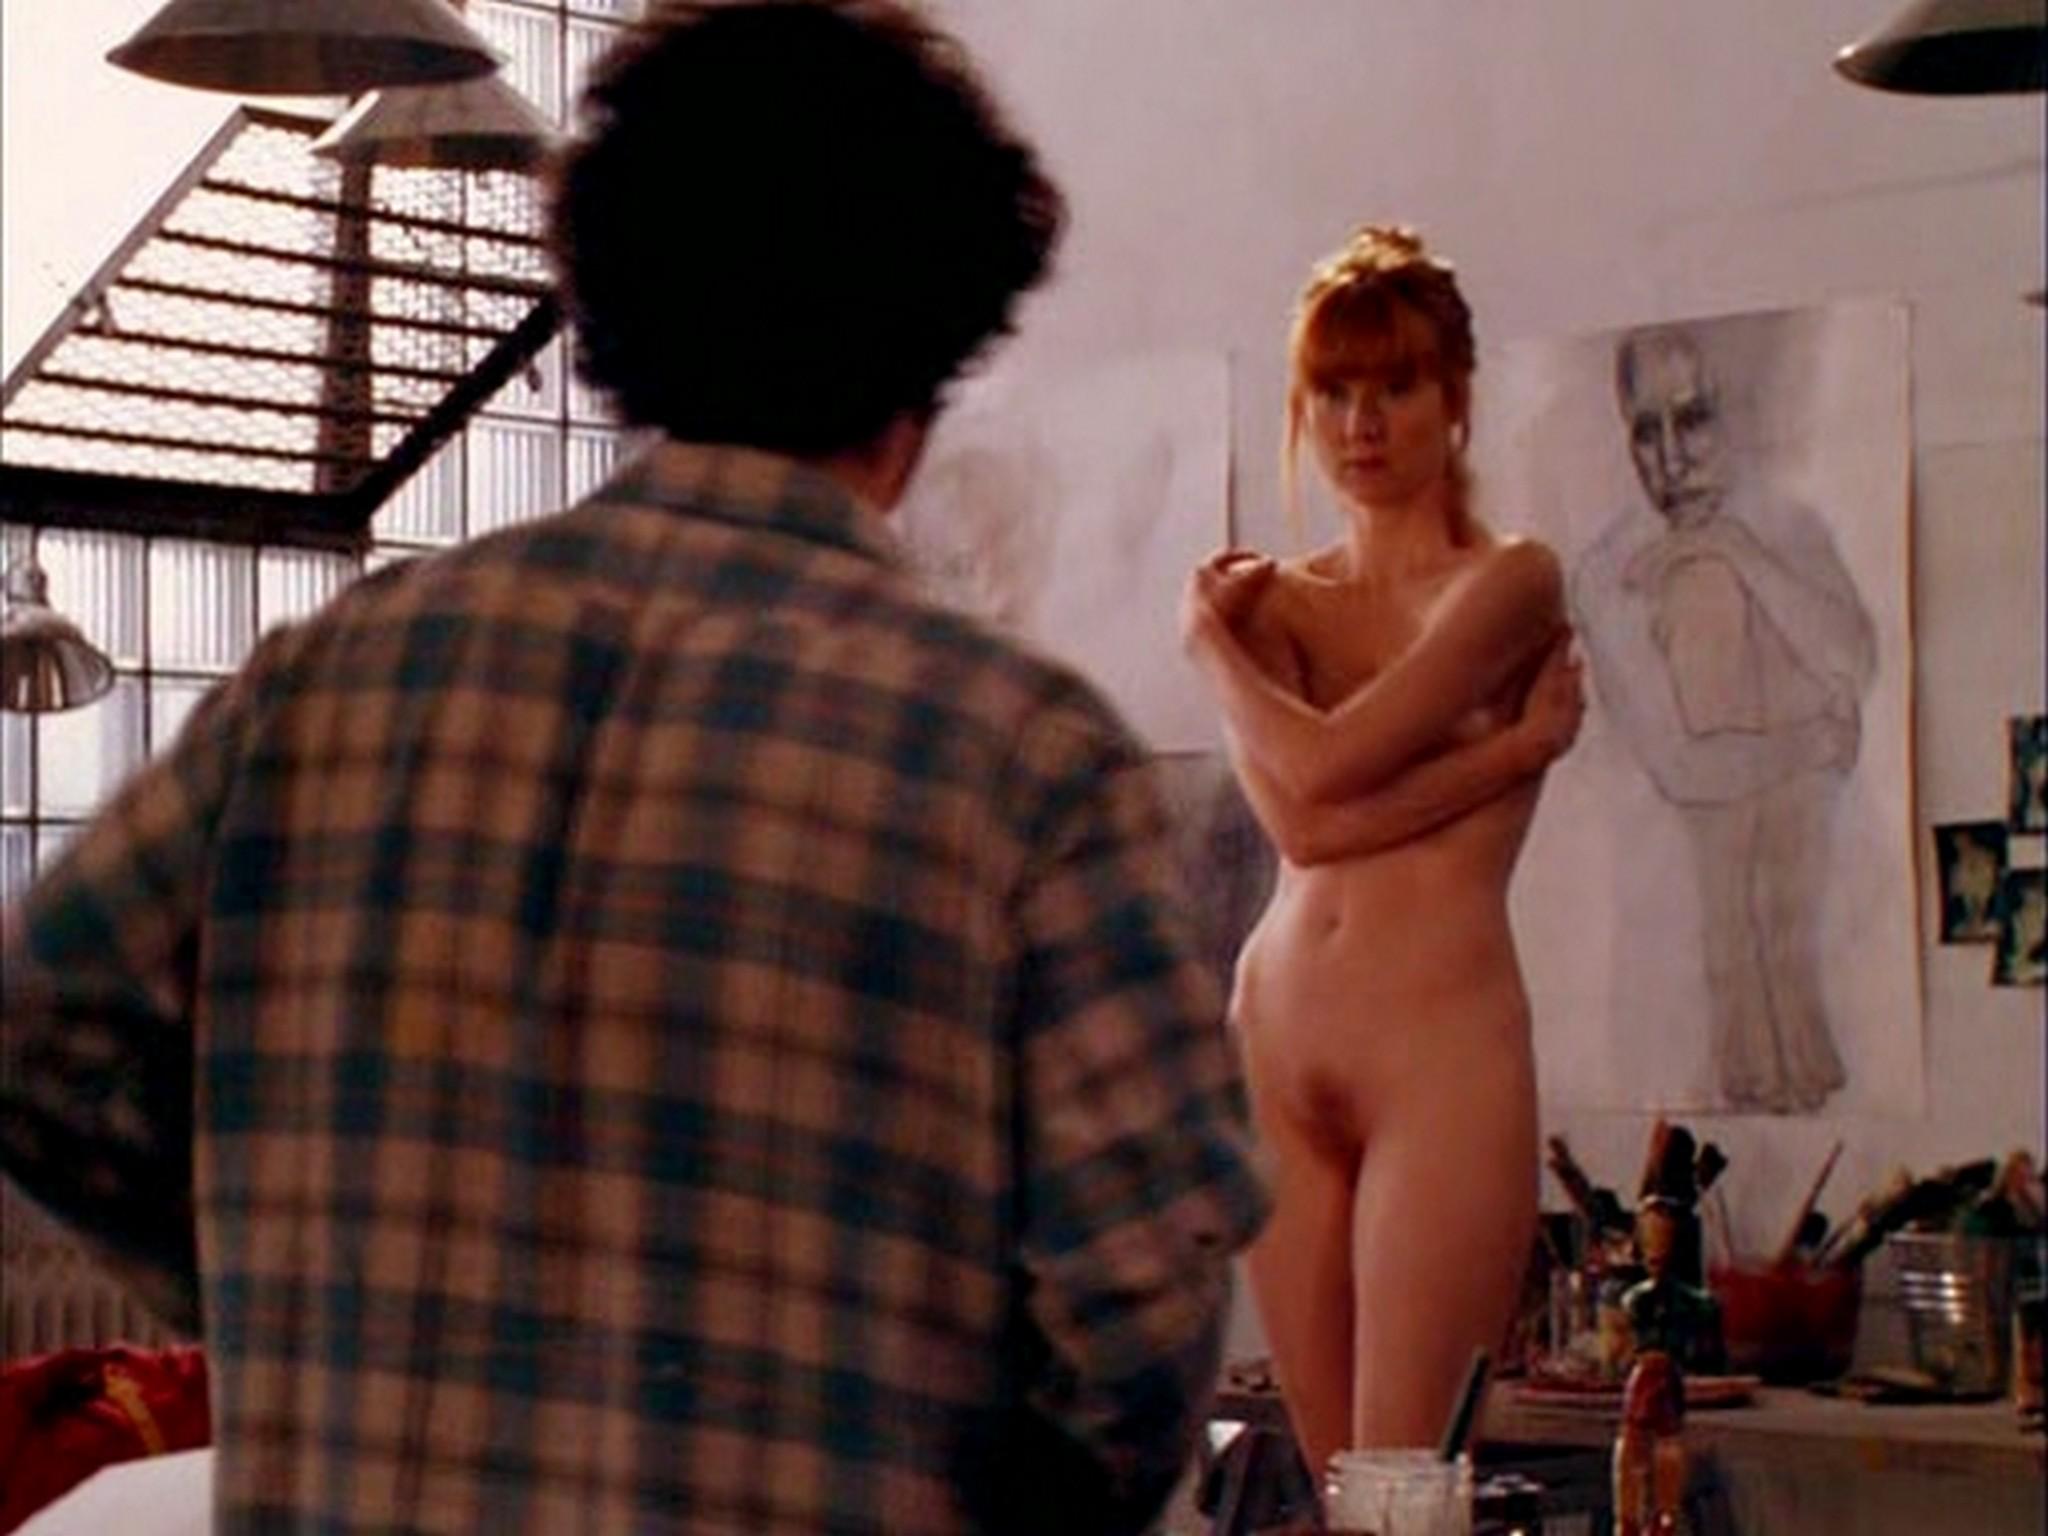 Laura Linney nude full frontal bush and Sheila Zane nude - Maze (2000) (4)